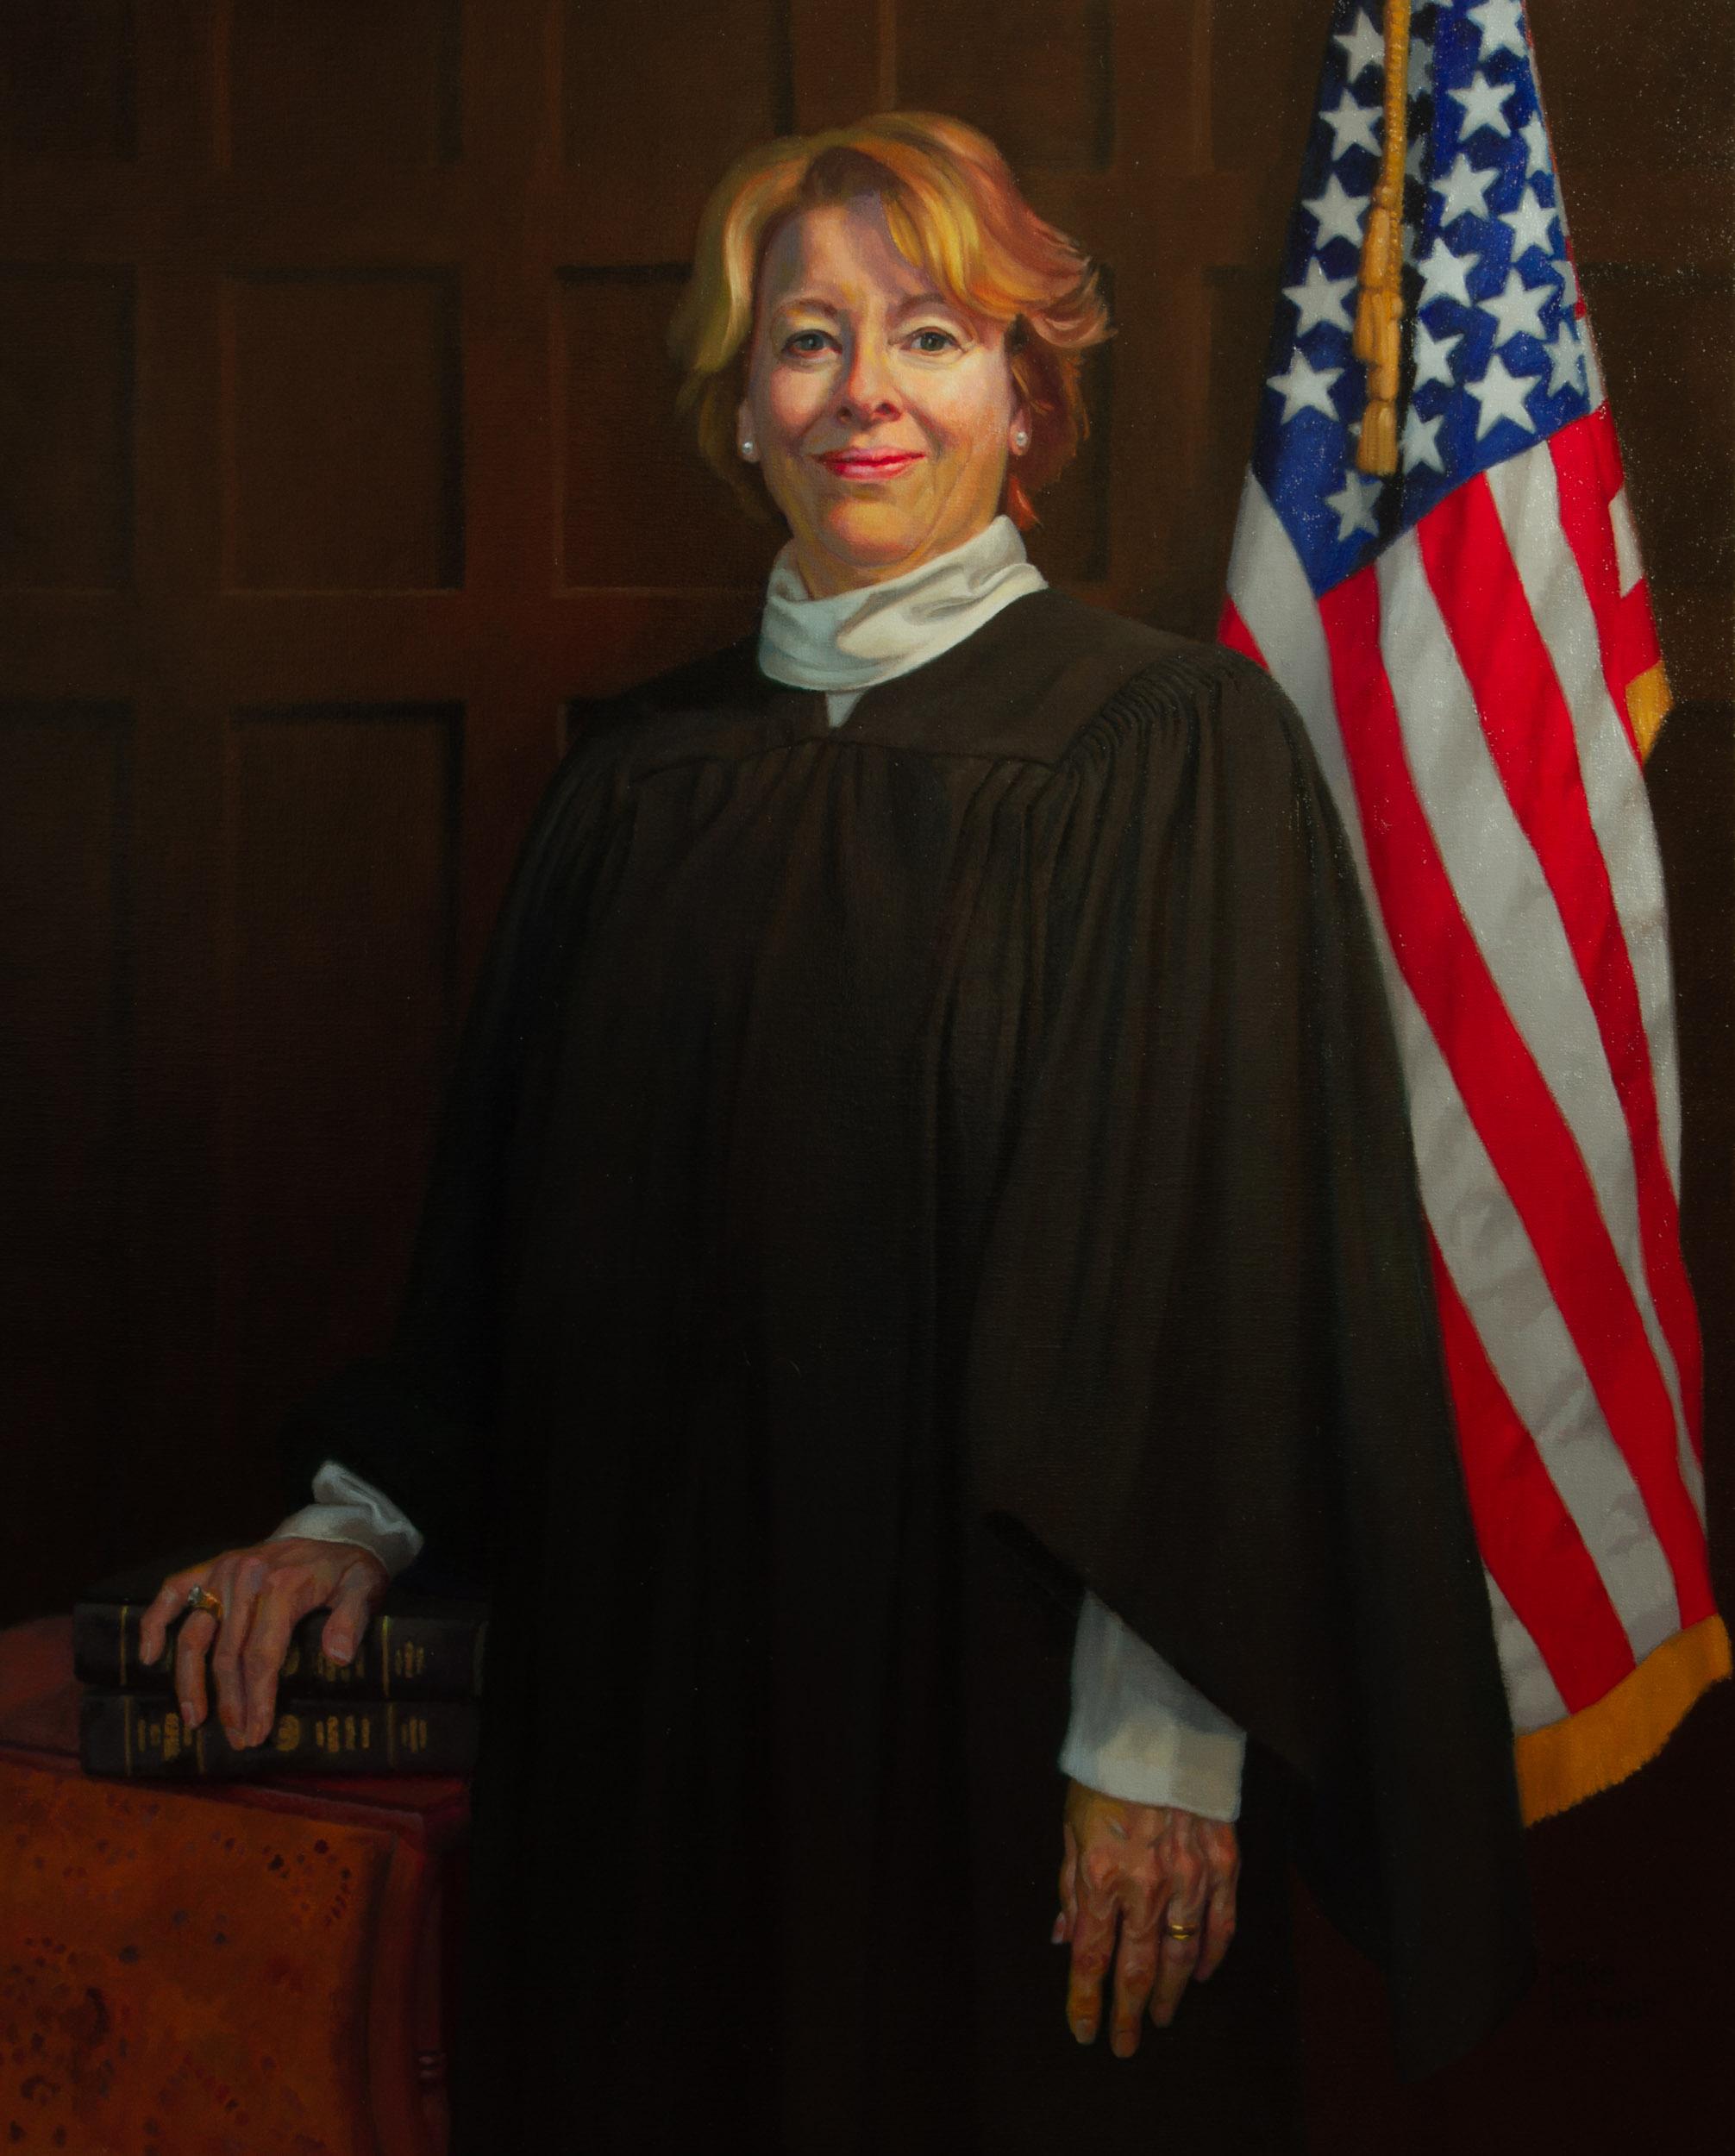 The Honorable Deborah Paxson